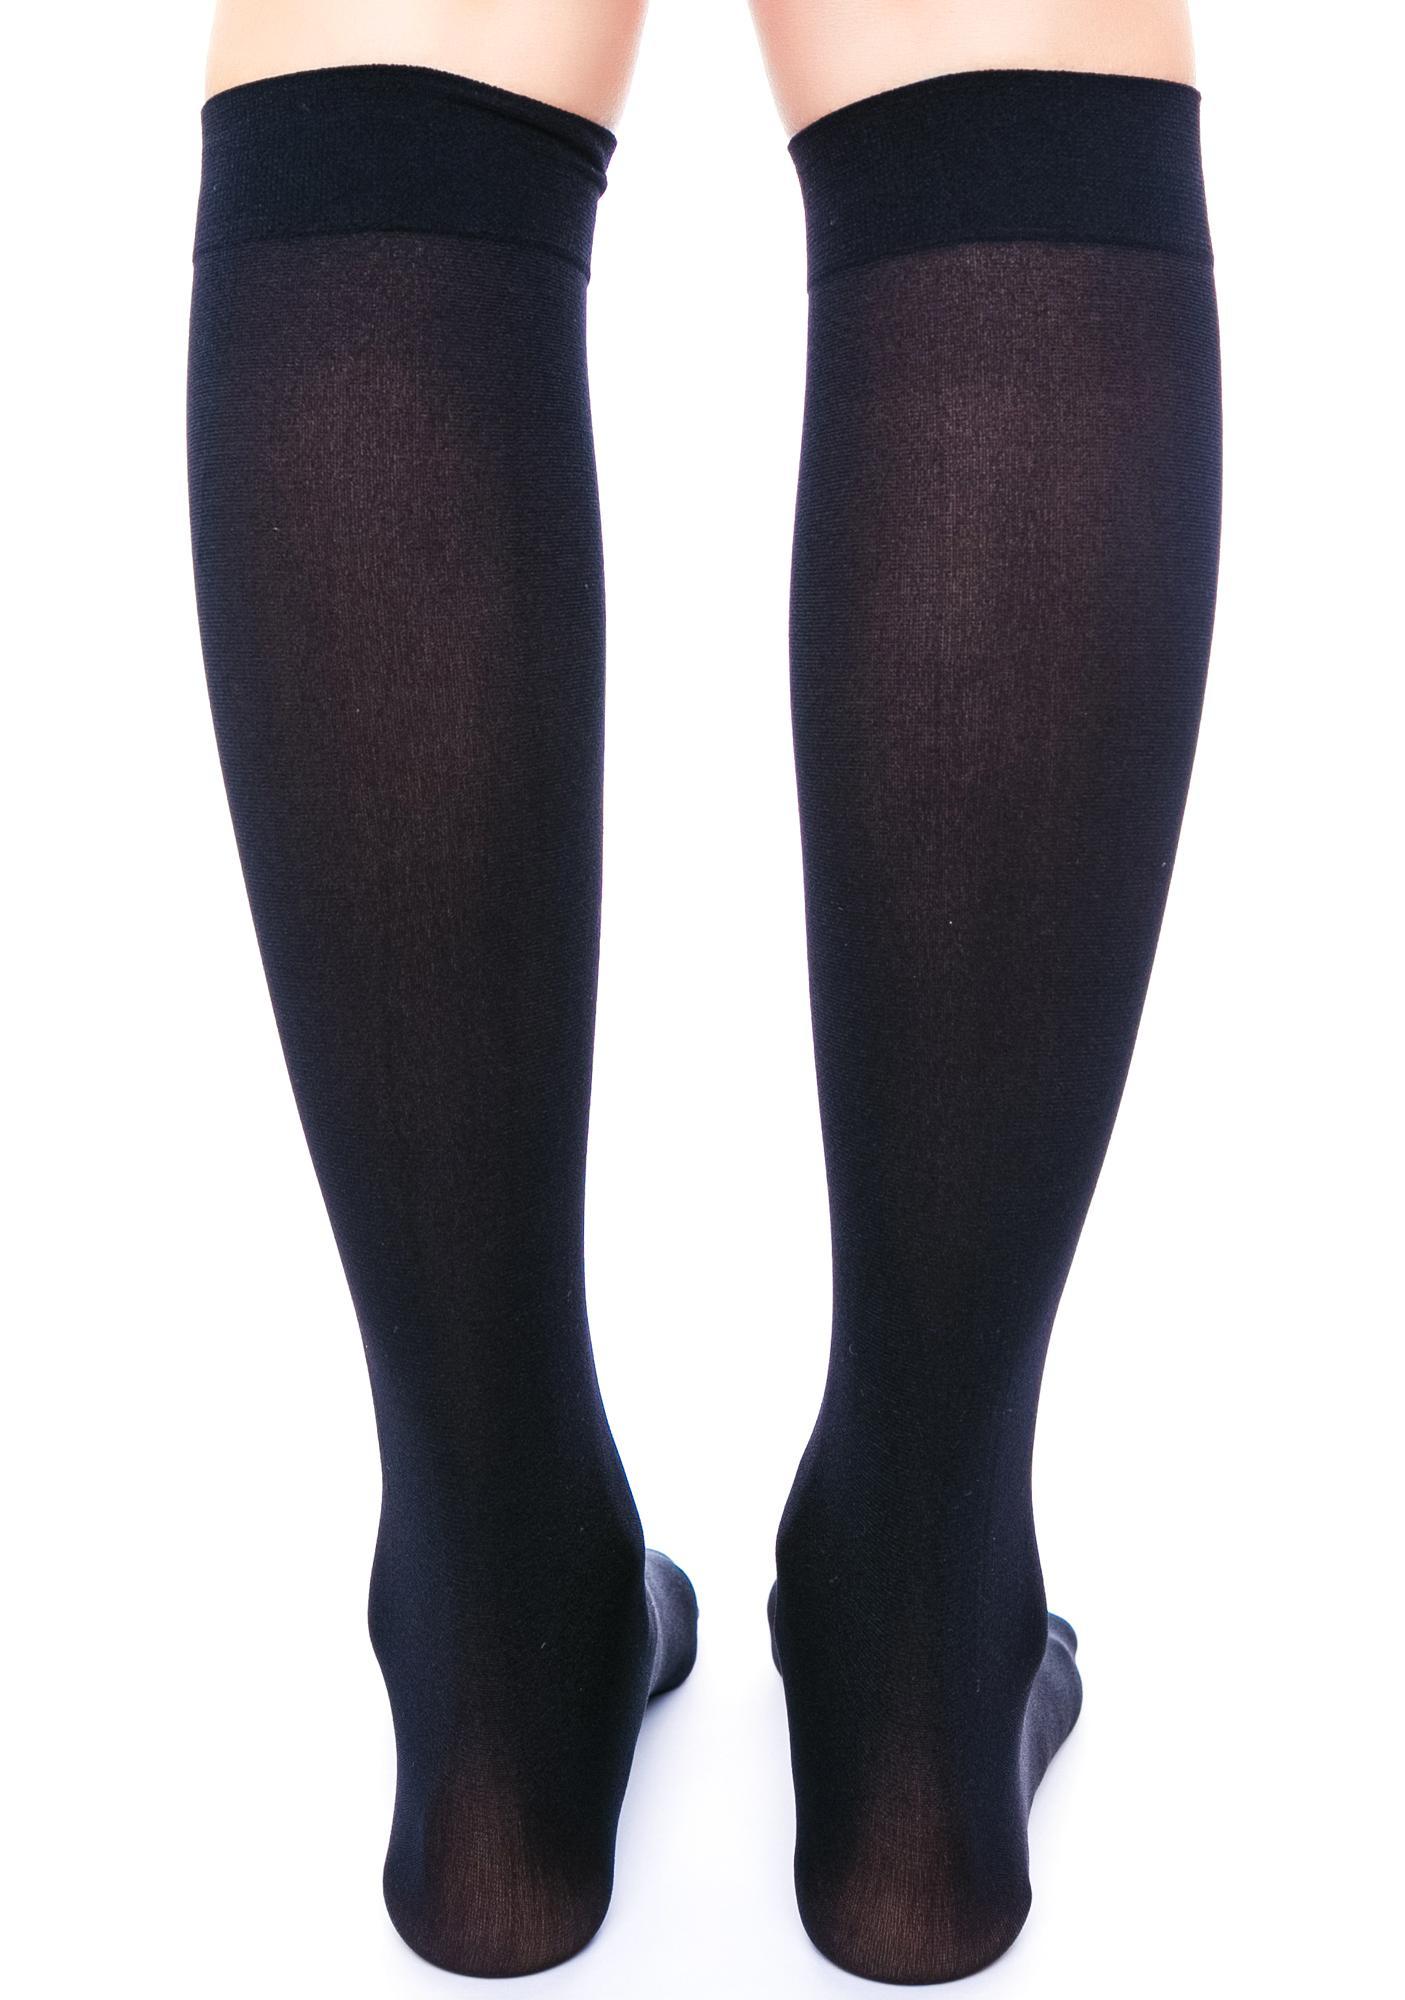 6 Girls Knee High Girls School Socks With Satin Bow all Size